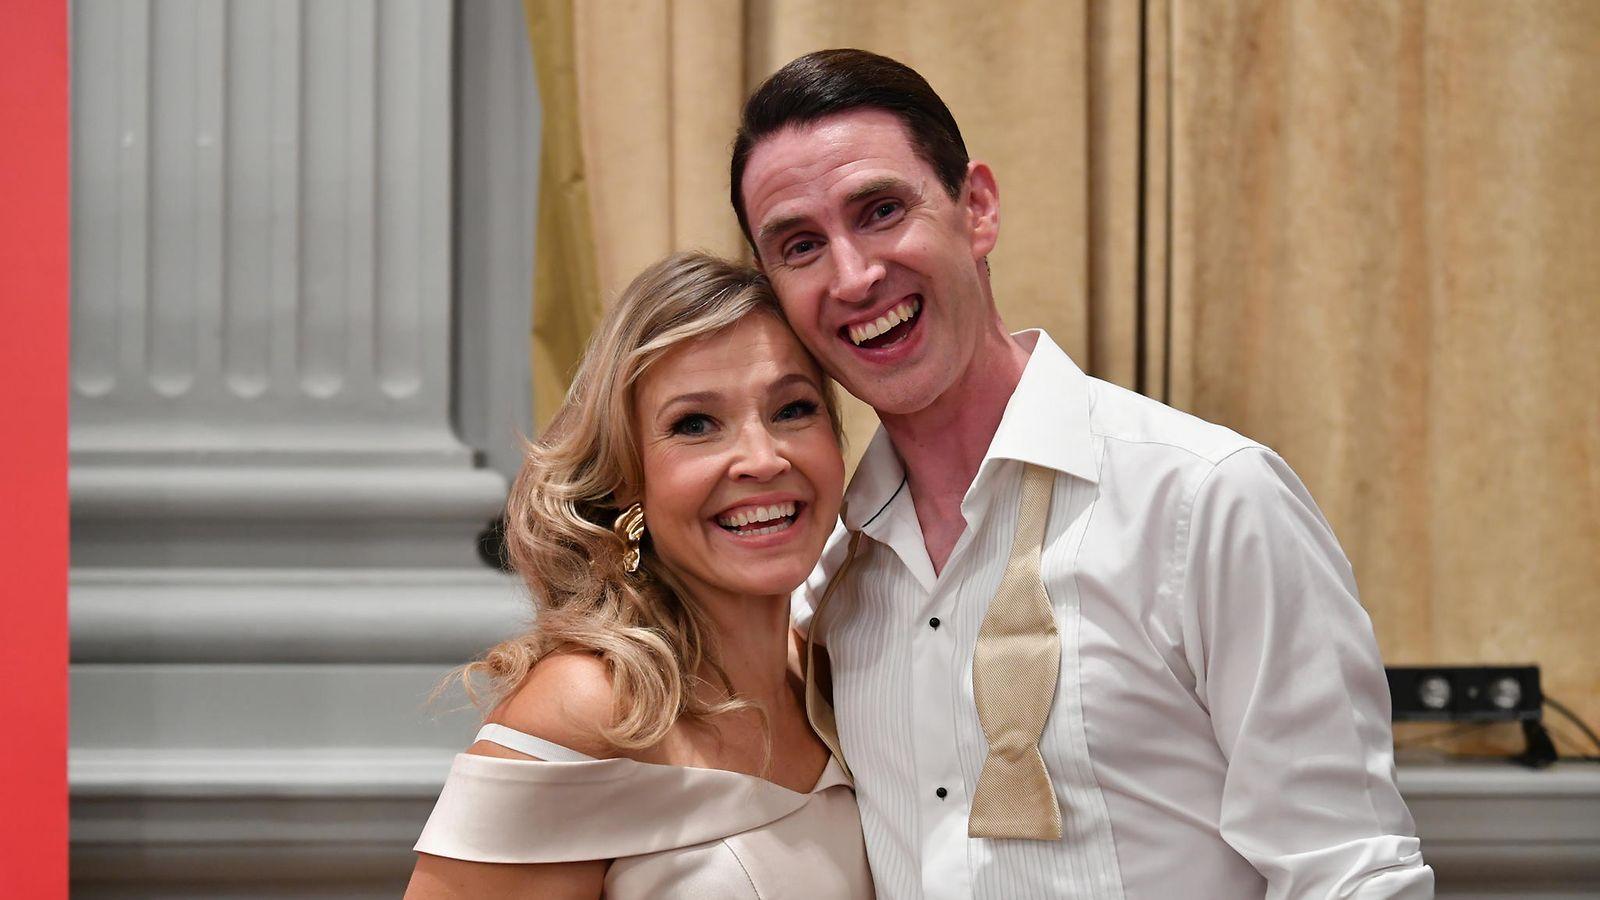 Martin Johnson dating Christina Perri